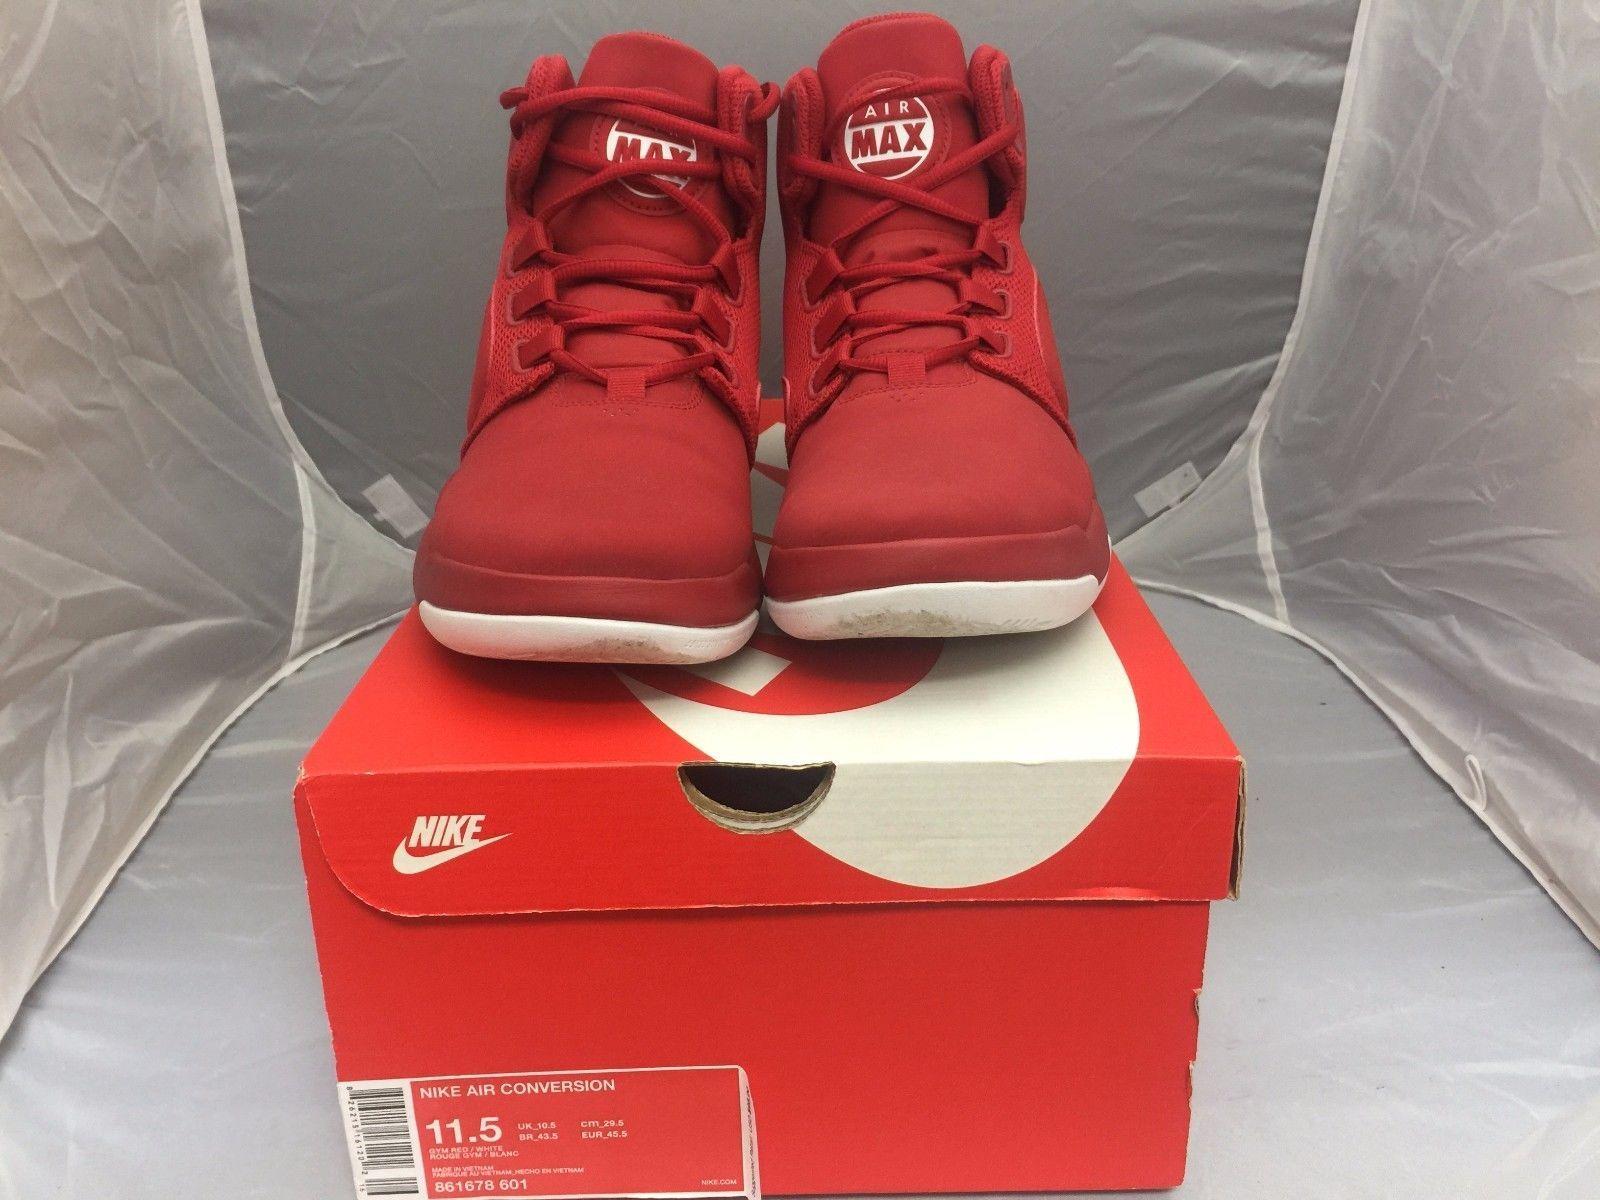 differently 1b247 4b8ca  Men  Shoes Men s Nike Air Conversion Basketball SIZE 11.5 Shoes 861678 601   Men  Shoes